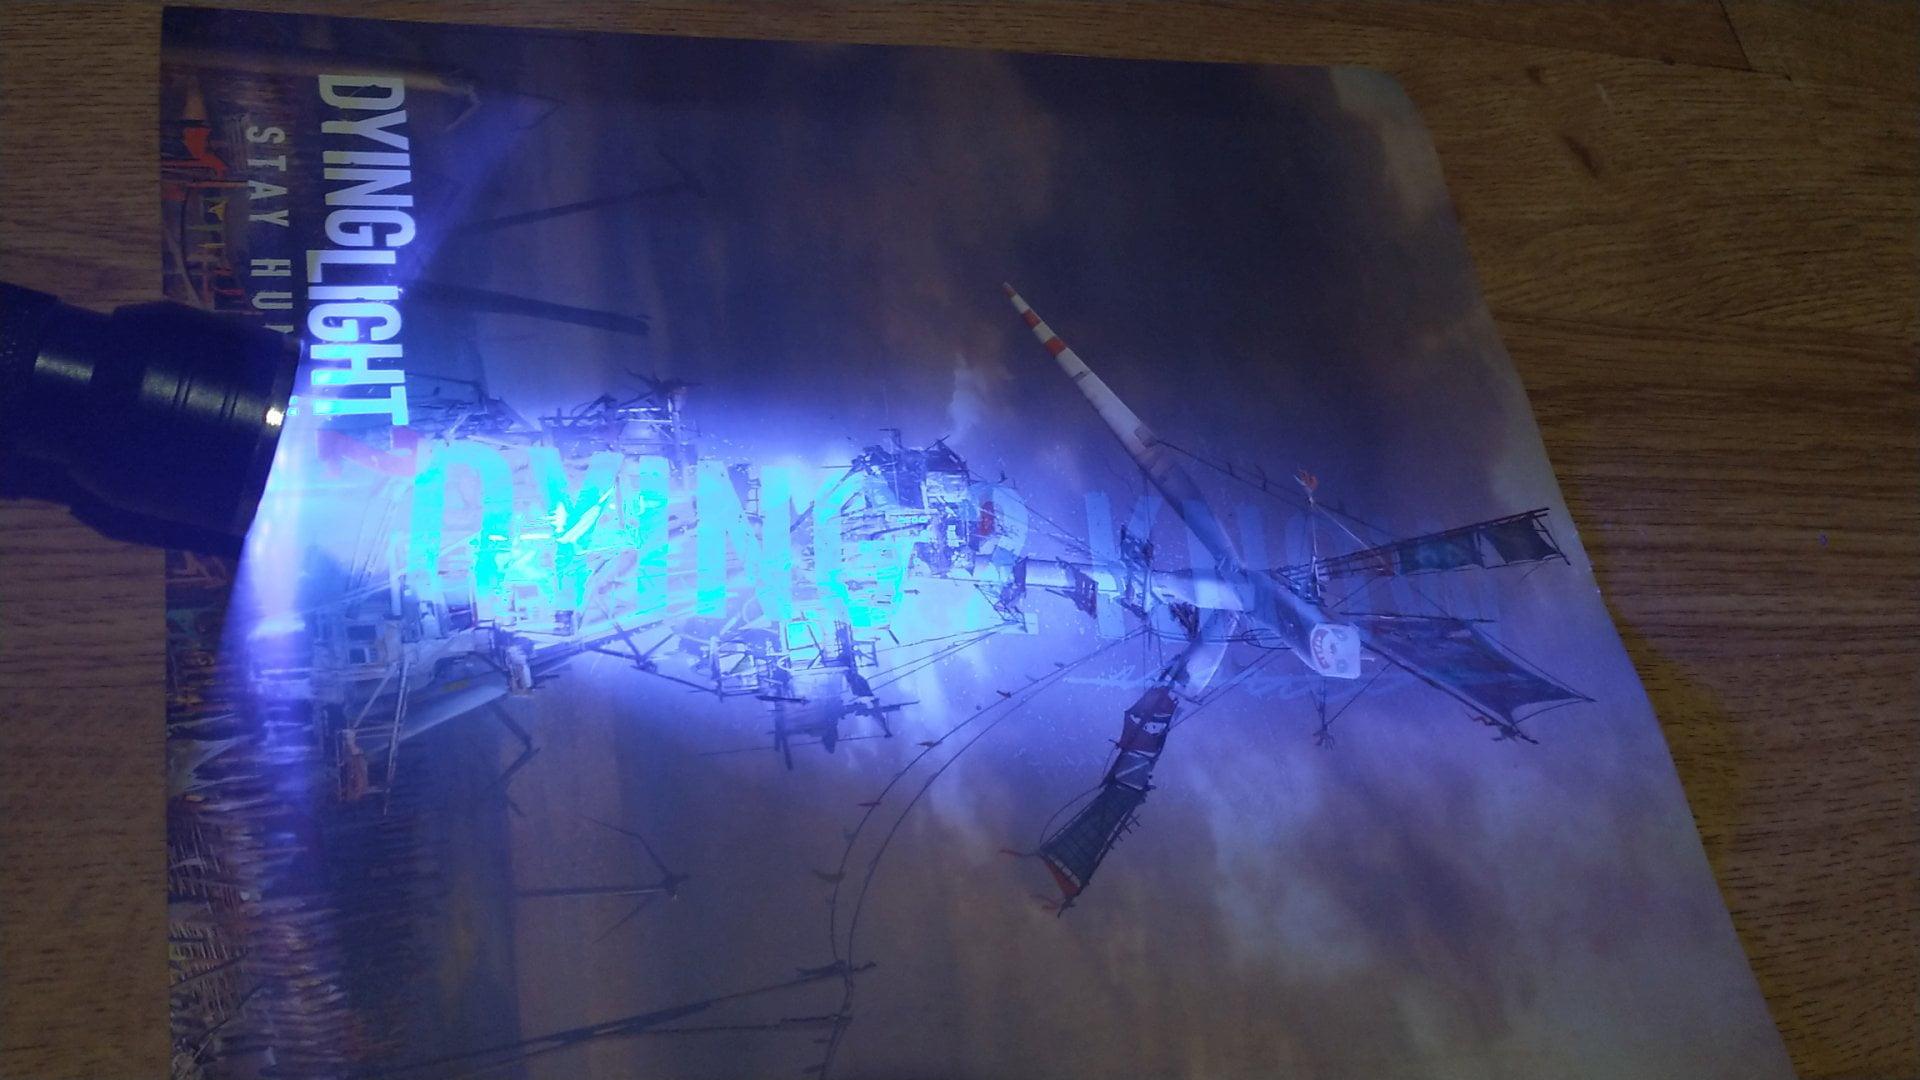 Dying Light 2 Press 5+1